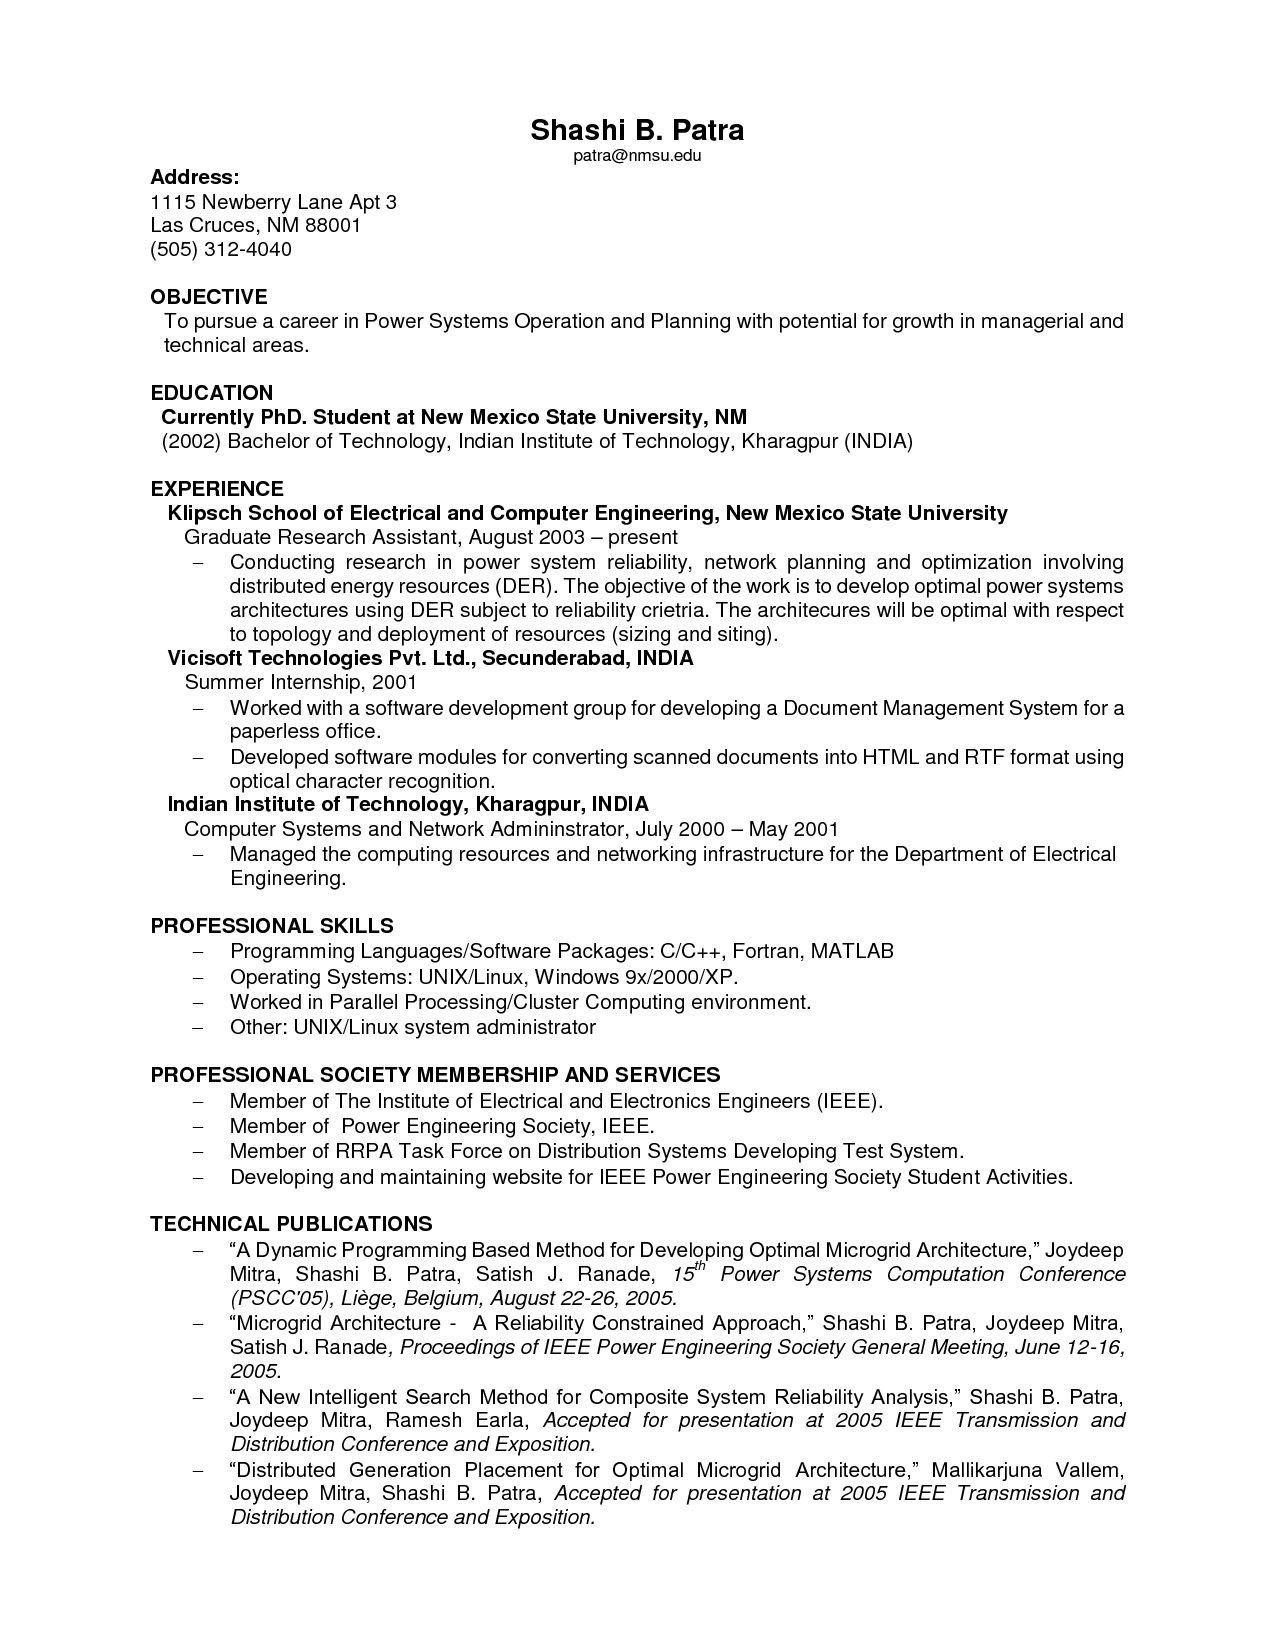 Resume Templates Unique Photos Resume Templates for